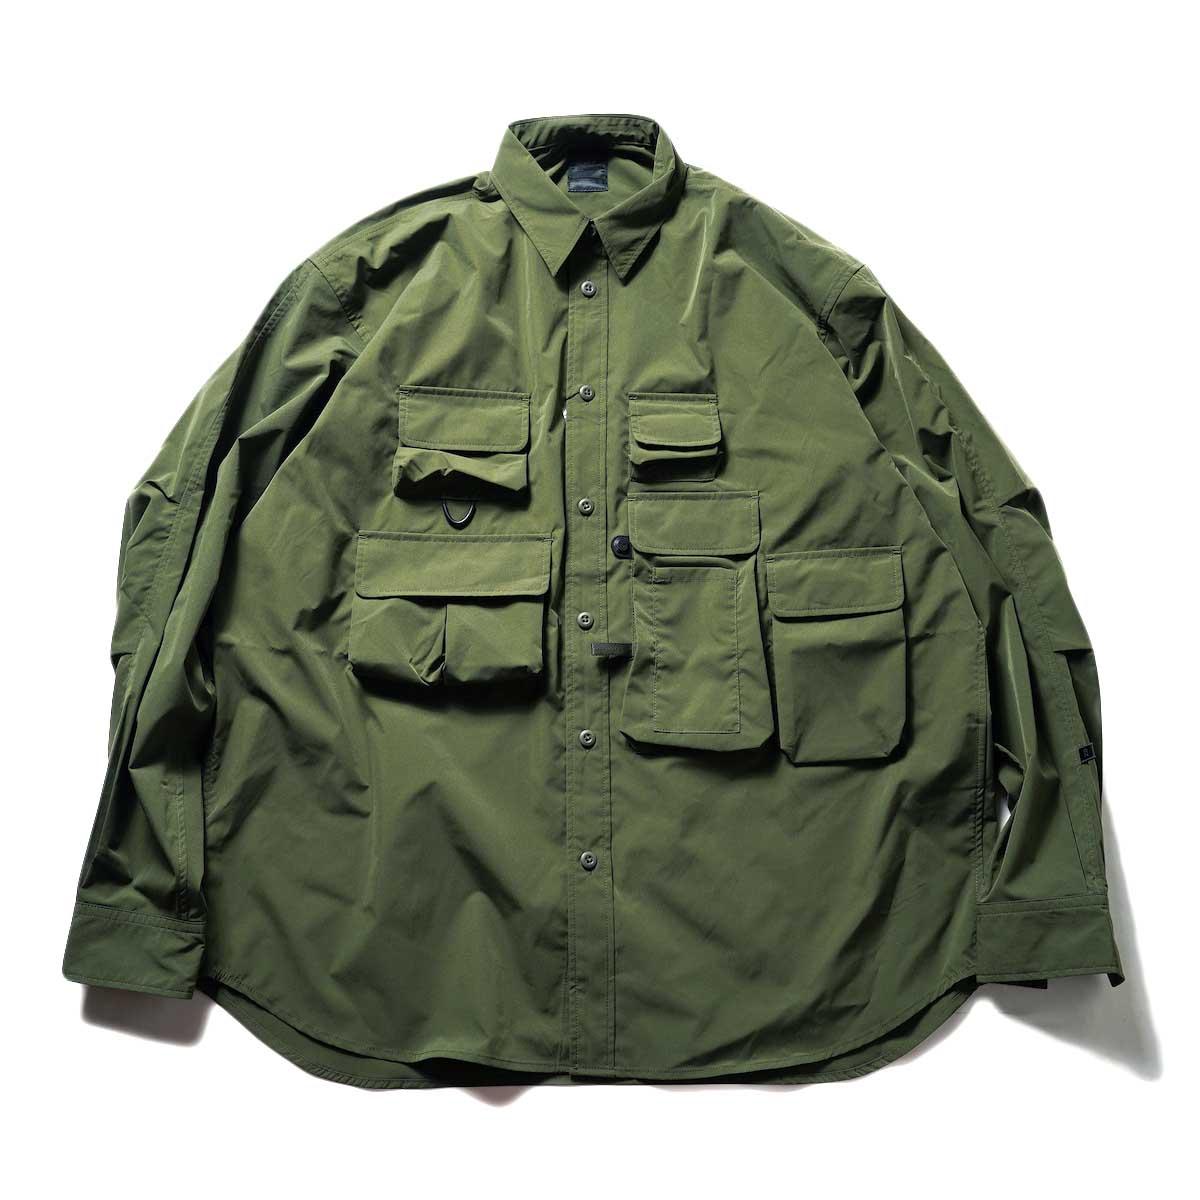 DAIWA PIER39 / Tech Angler's Shirt L/S (Olive)